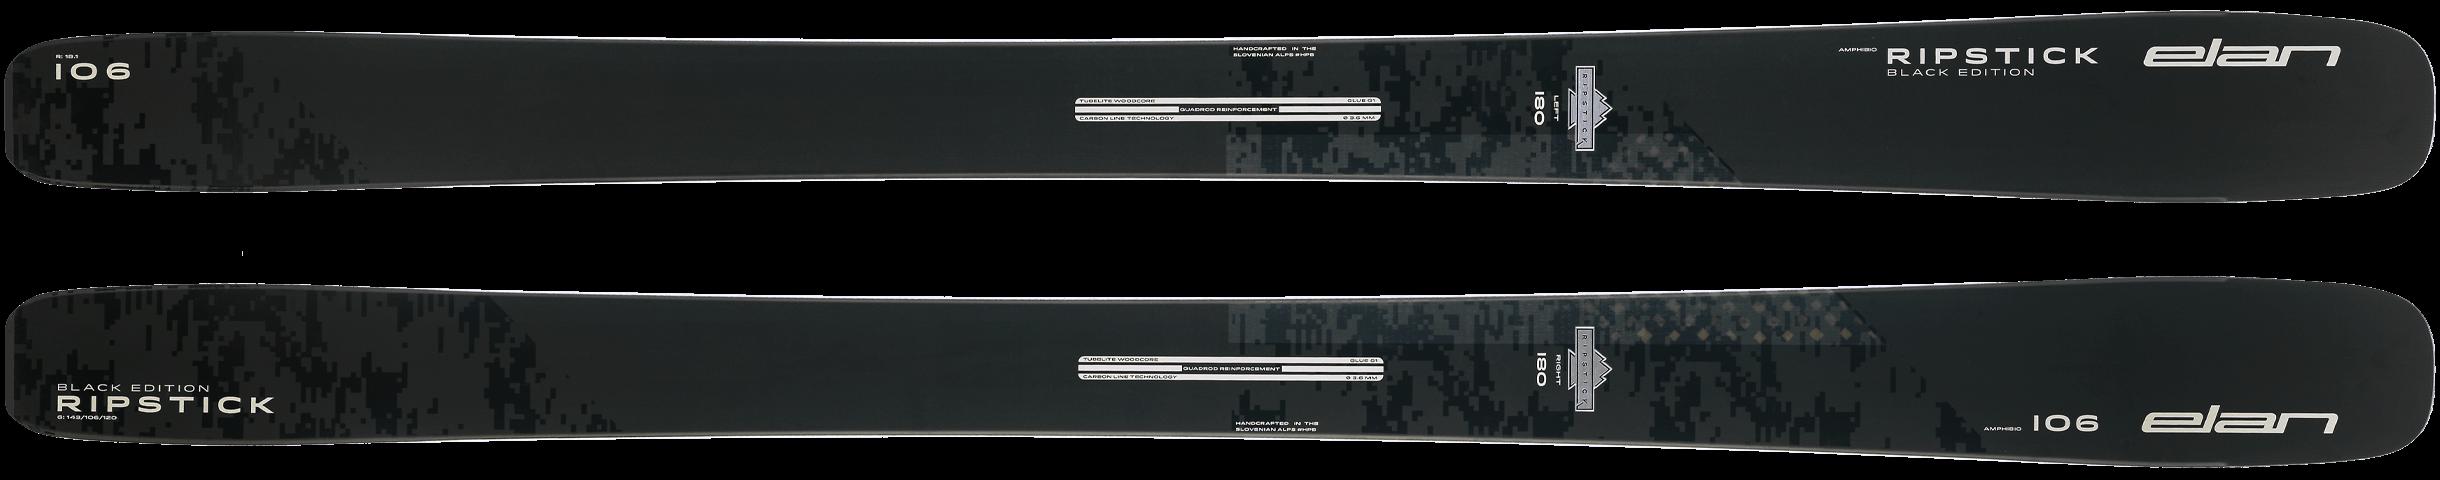 Ripstick 96 Black Edition